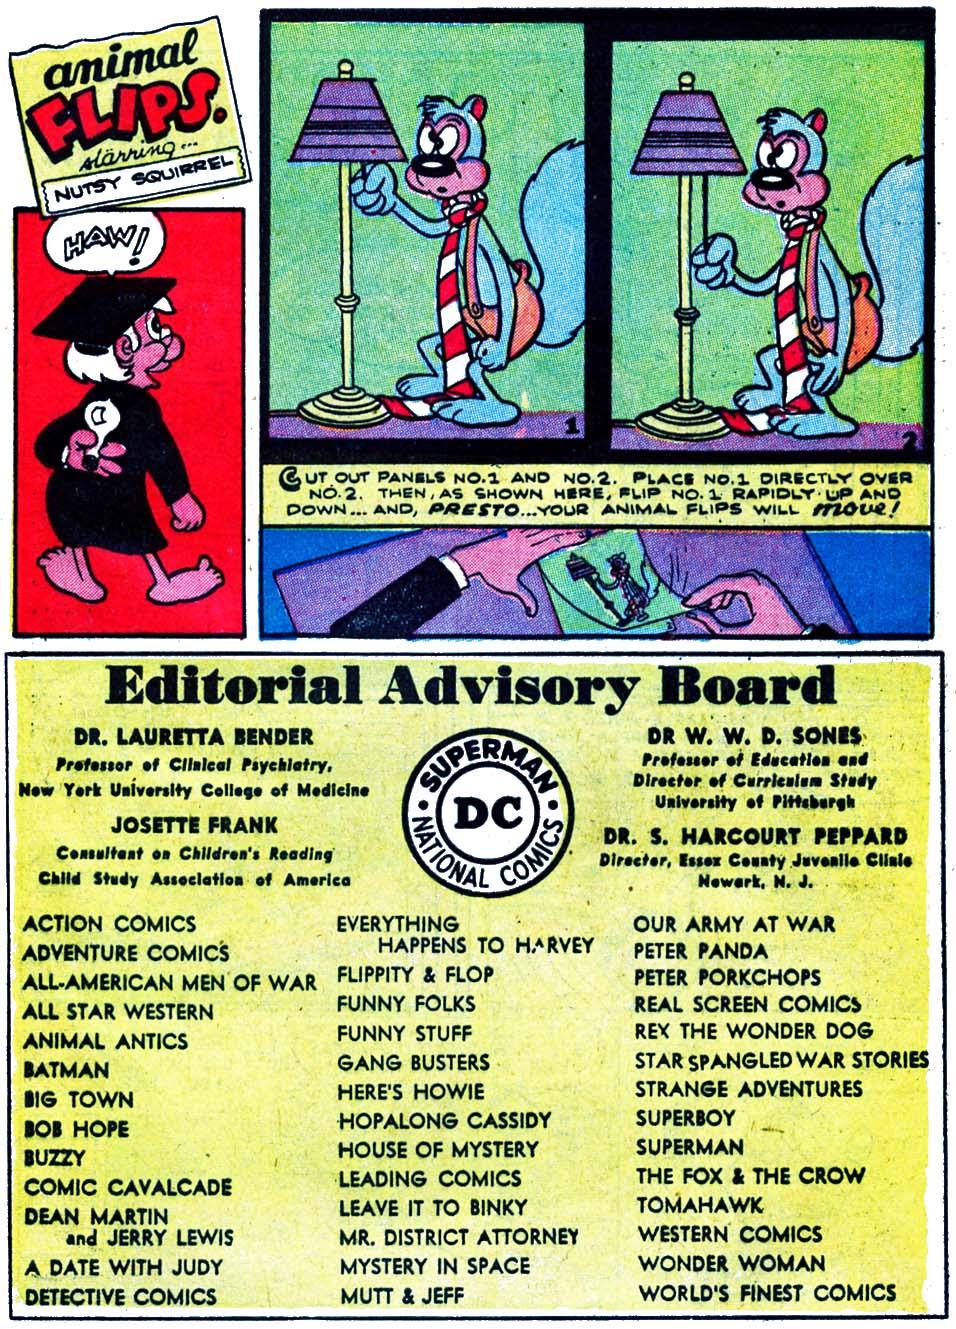 Comic Cavalcade #63 - Read Comic Cavalcade Issue #63 Online | Full Page